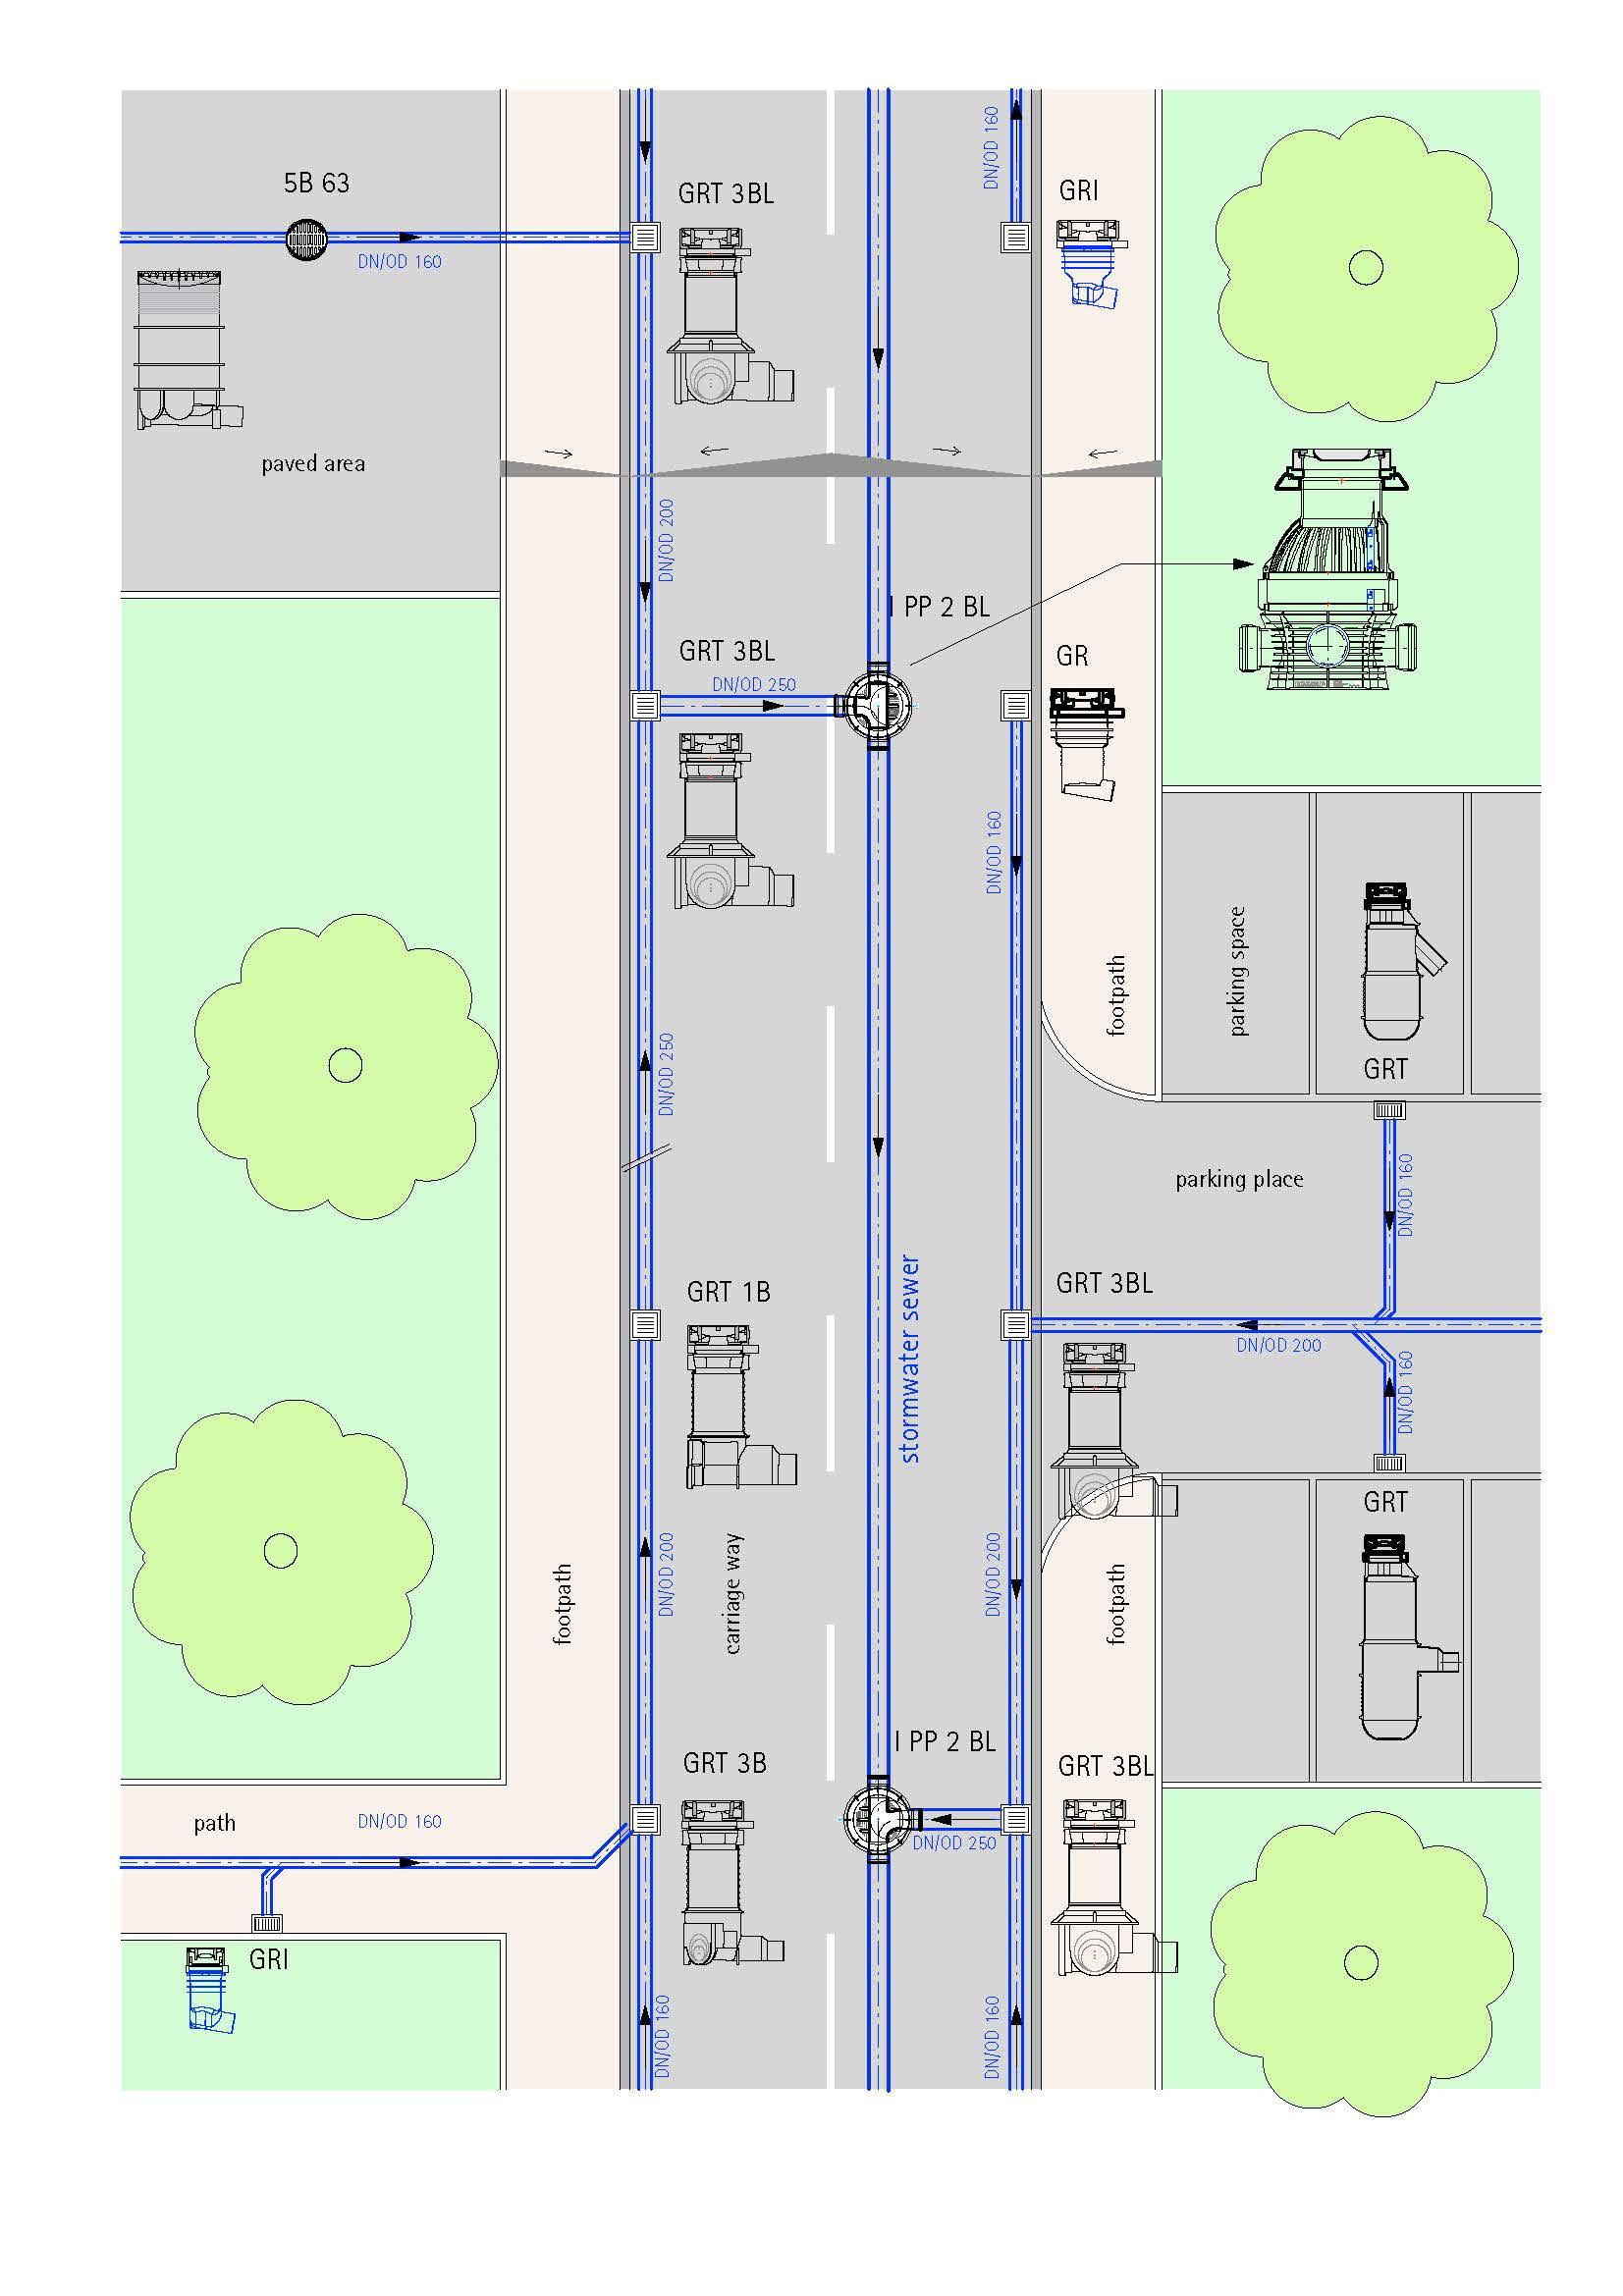 Straßenabläufe-System-Lageplan-Kurztext-2-EN